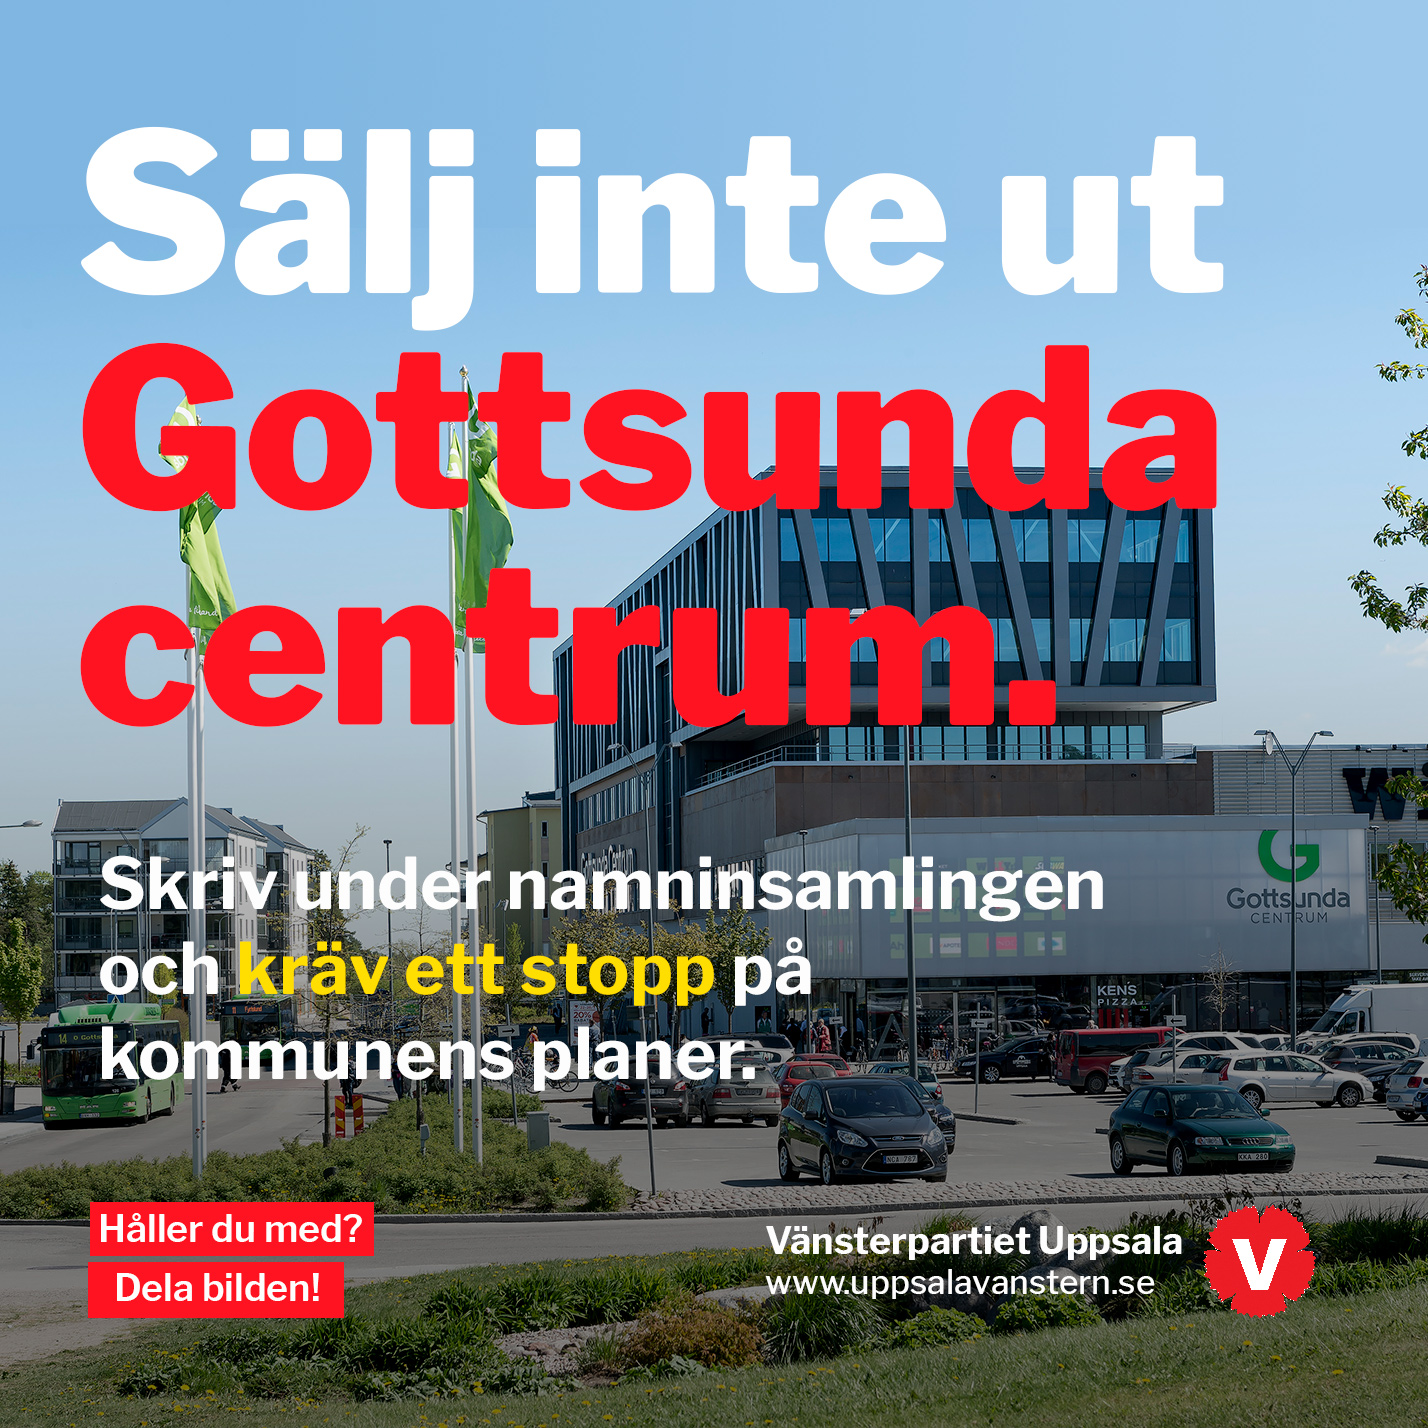 Sälj inte ut Gottsunda centrum